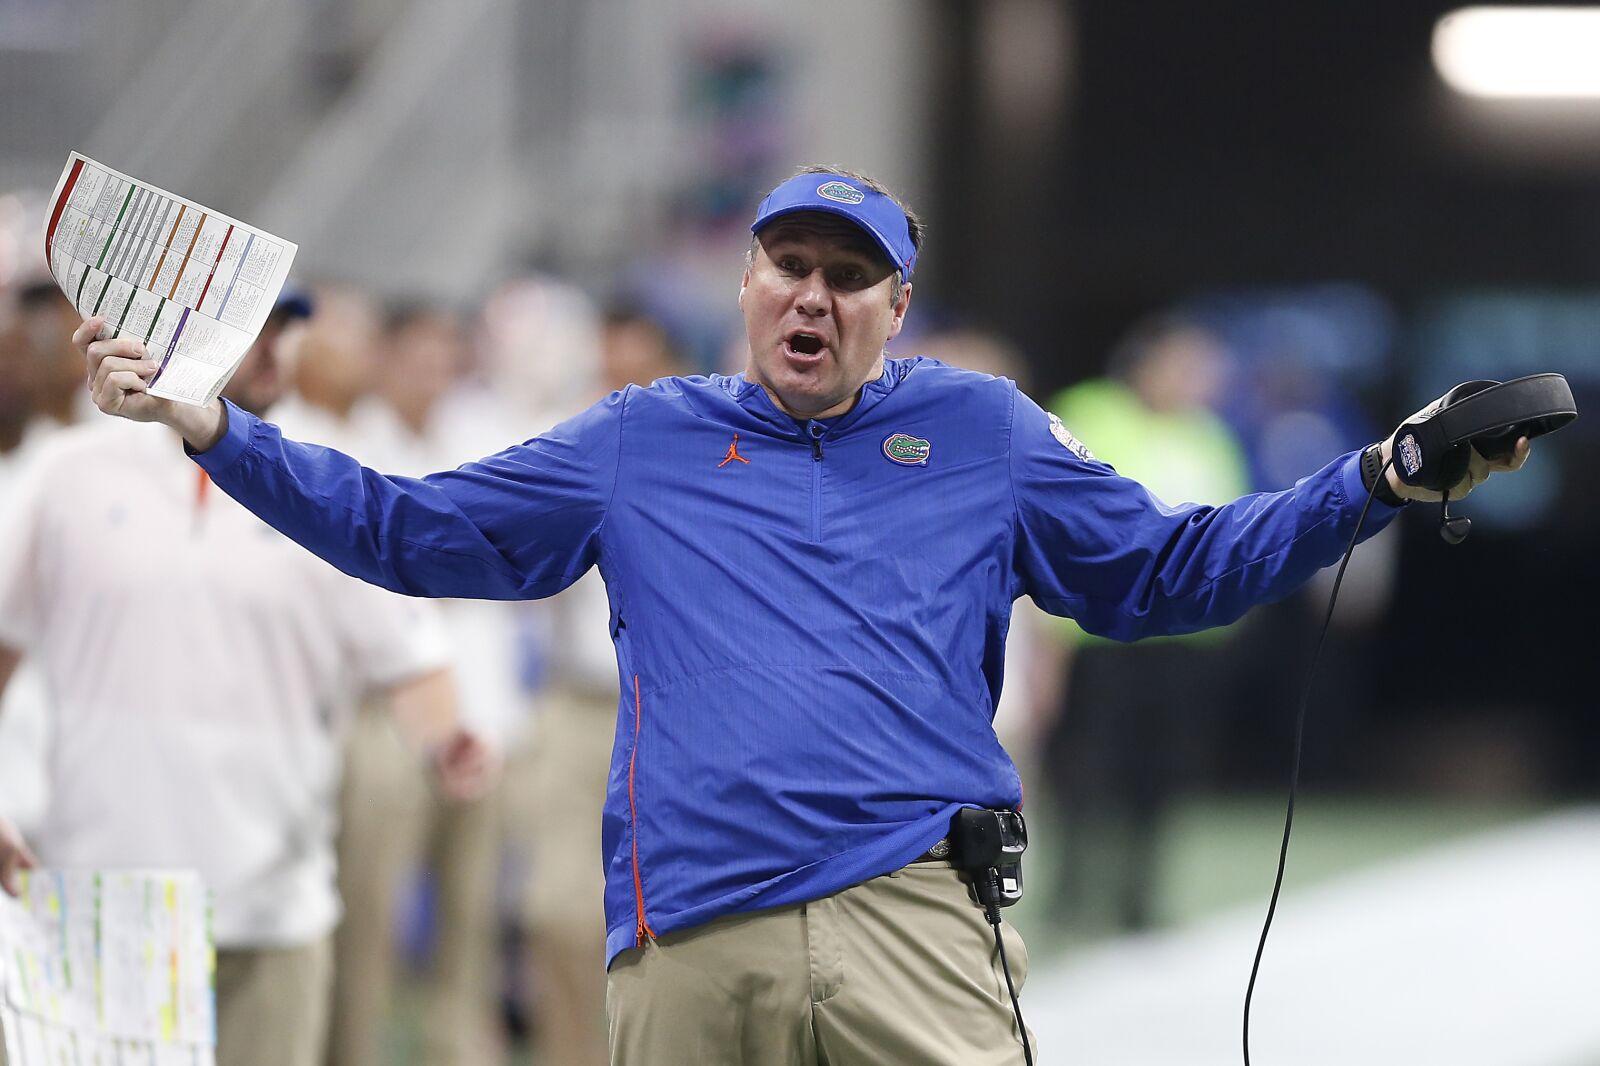 Florida Football: Are Gators becoming 'Transfer Portal U' under Dan Mullen?